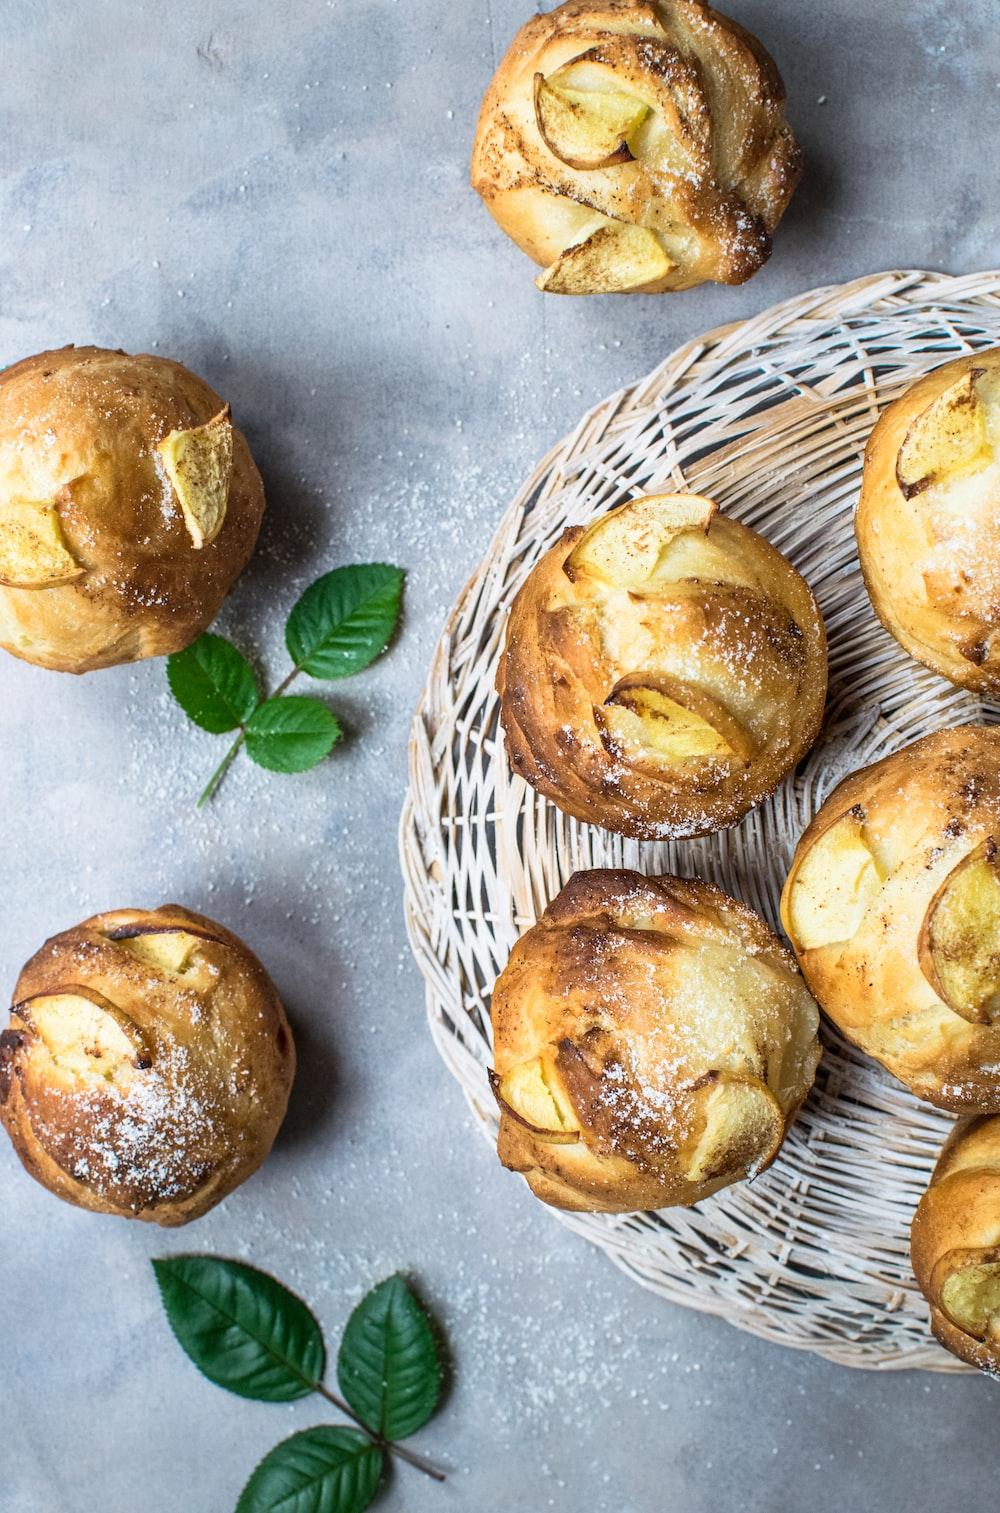 brown pastry on brown wicker basket